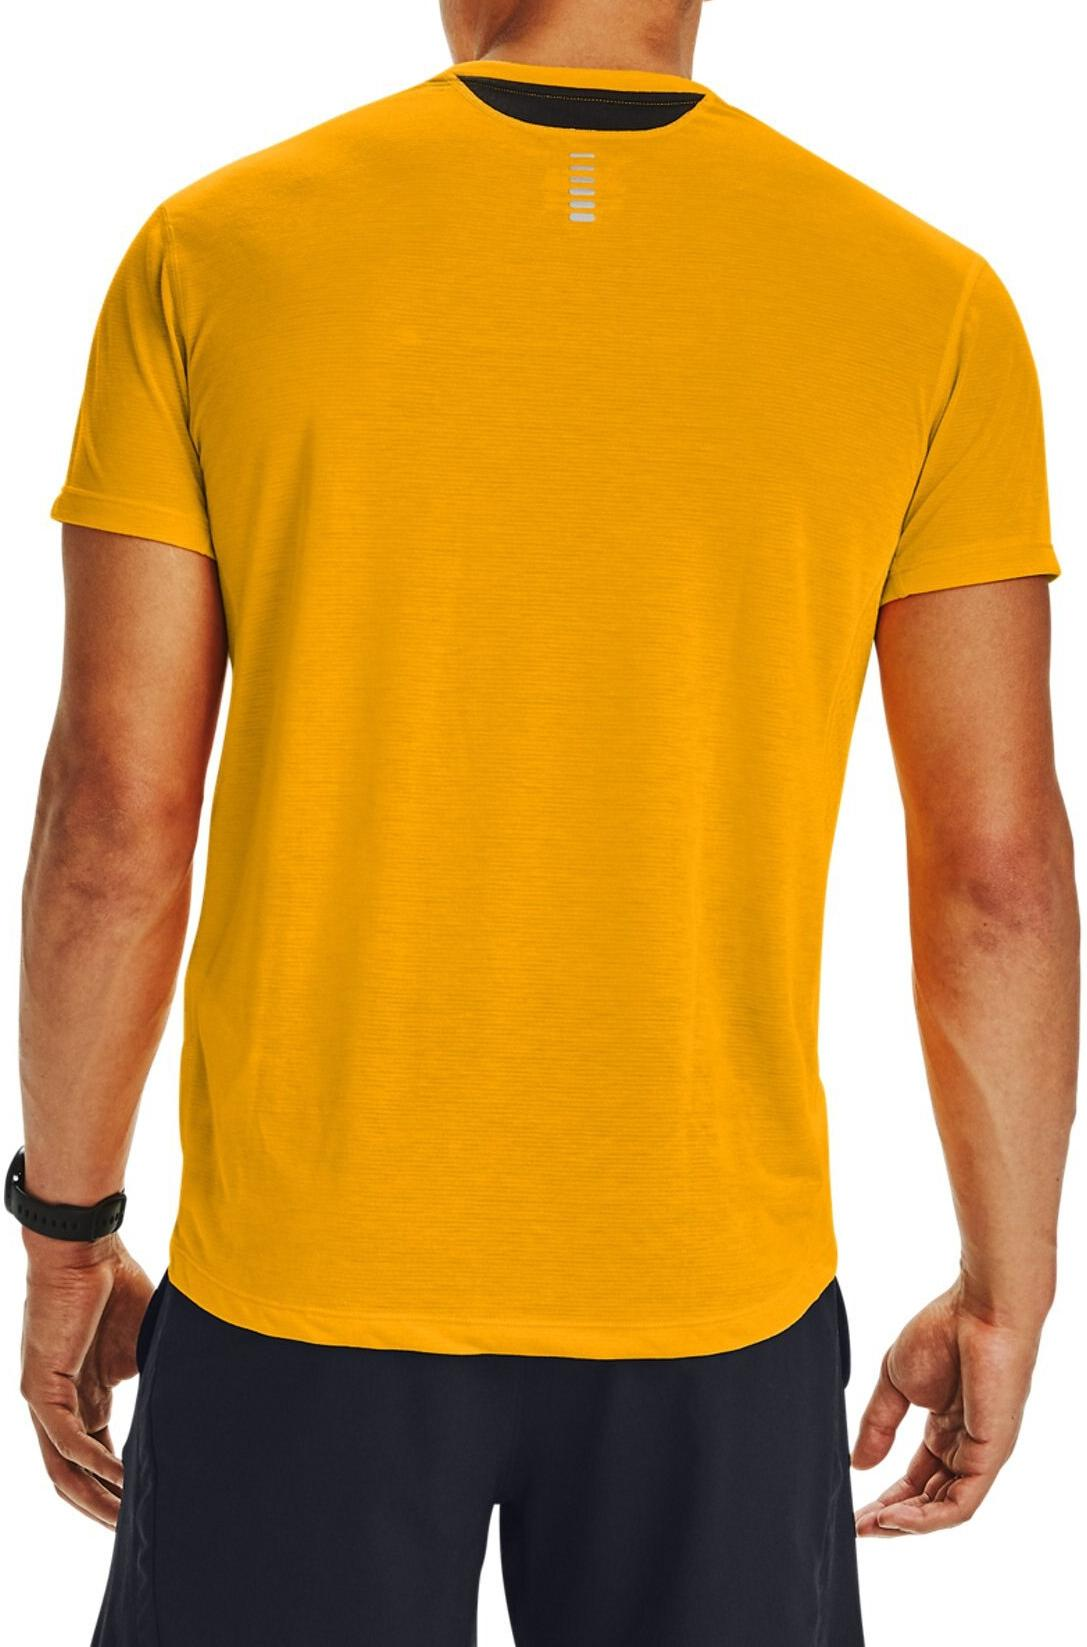 Orange Under Armour Streaker 2.0 Short Sleeve Mens Running Top